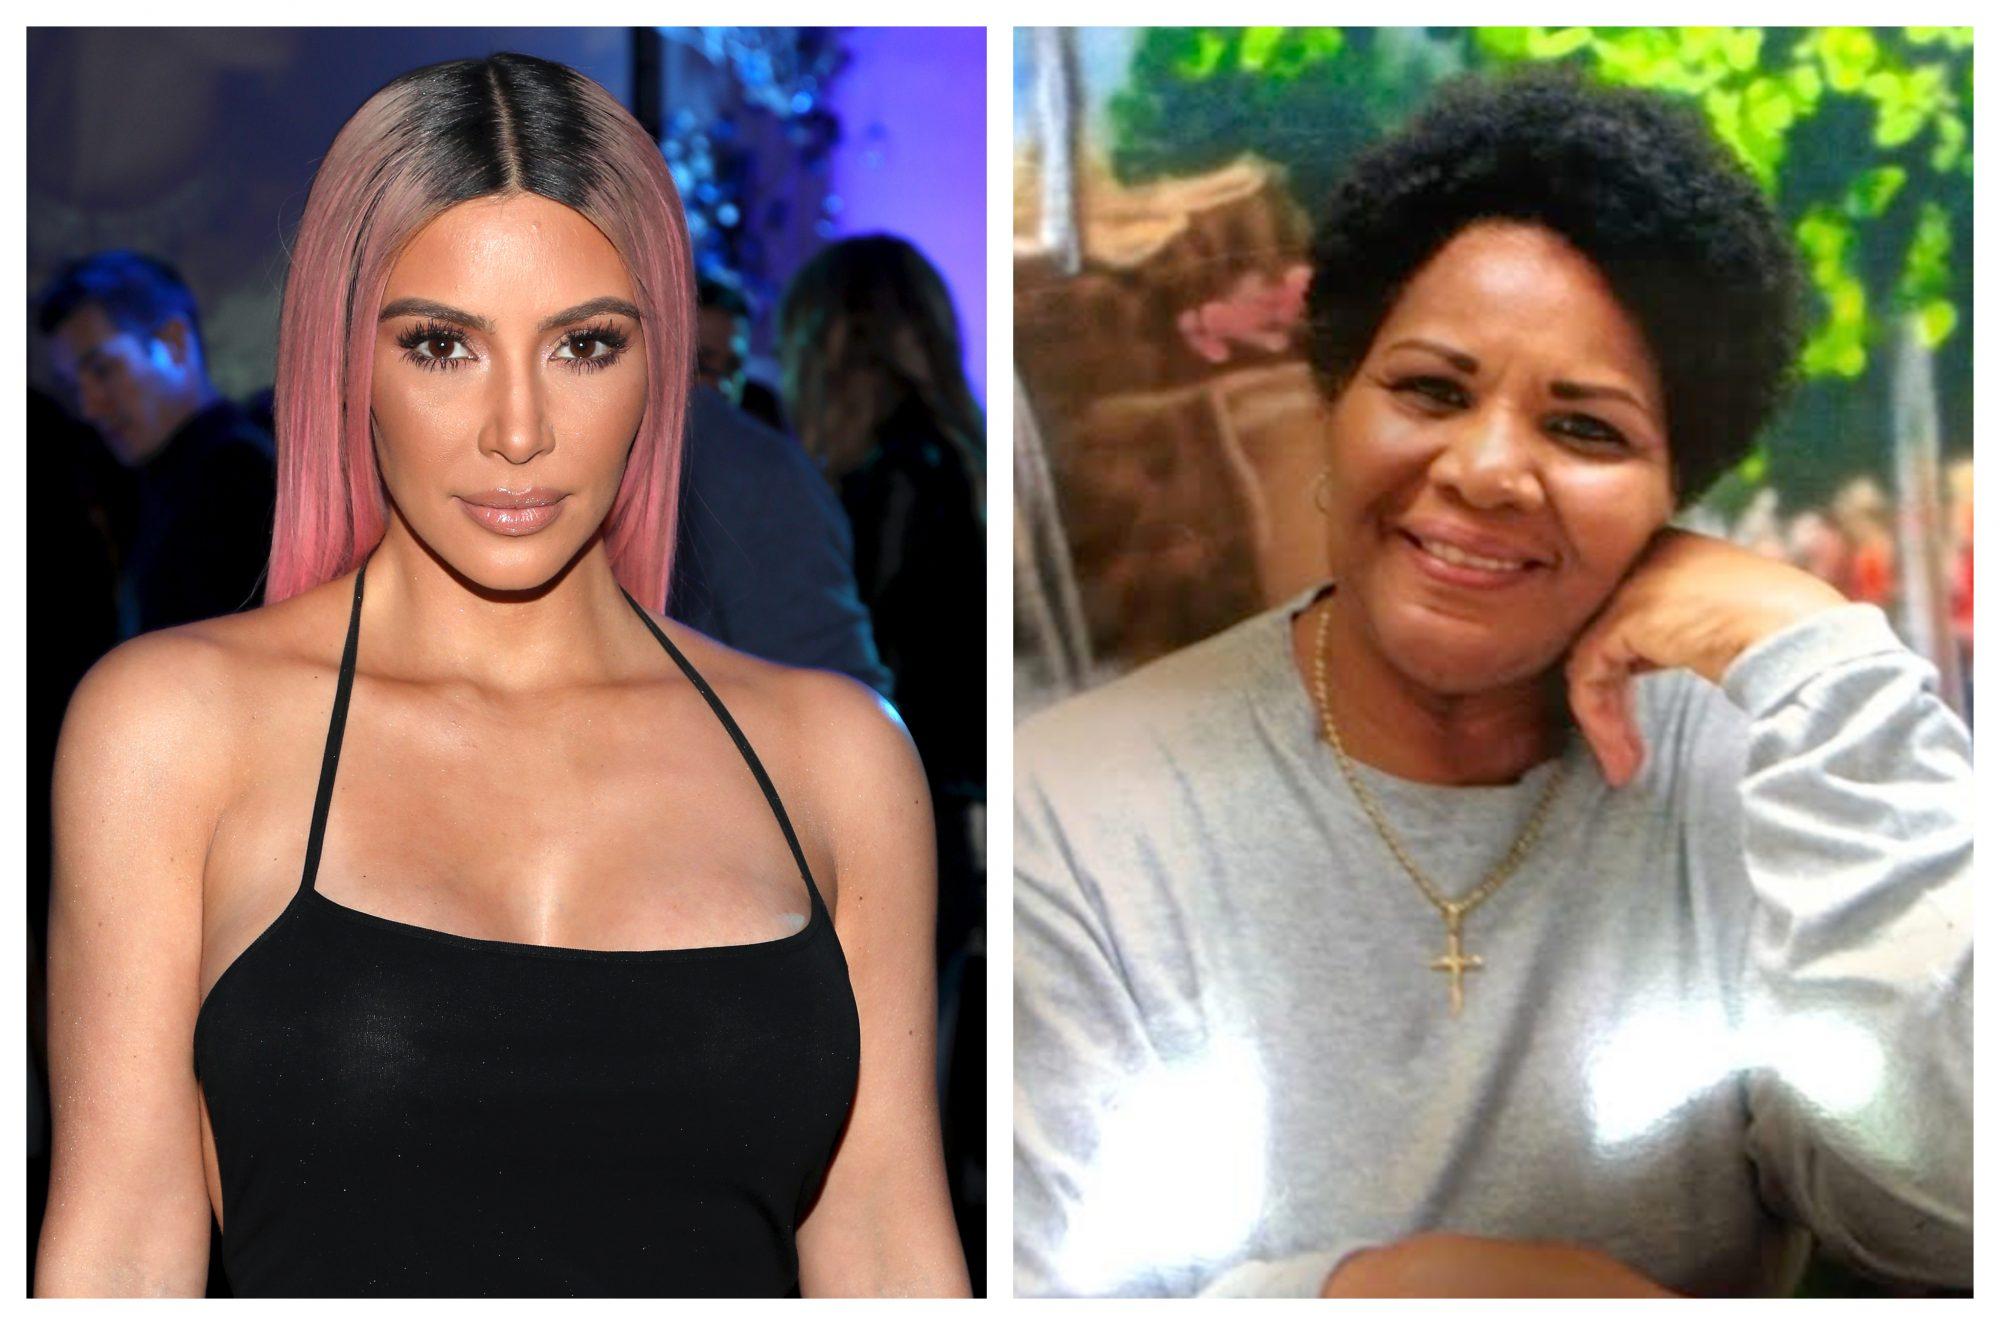 Image of Kim Kardashian and Alice Johnson